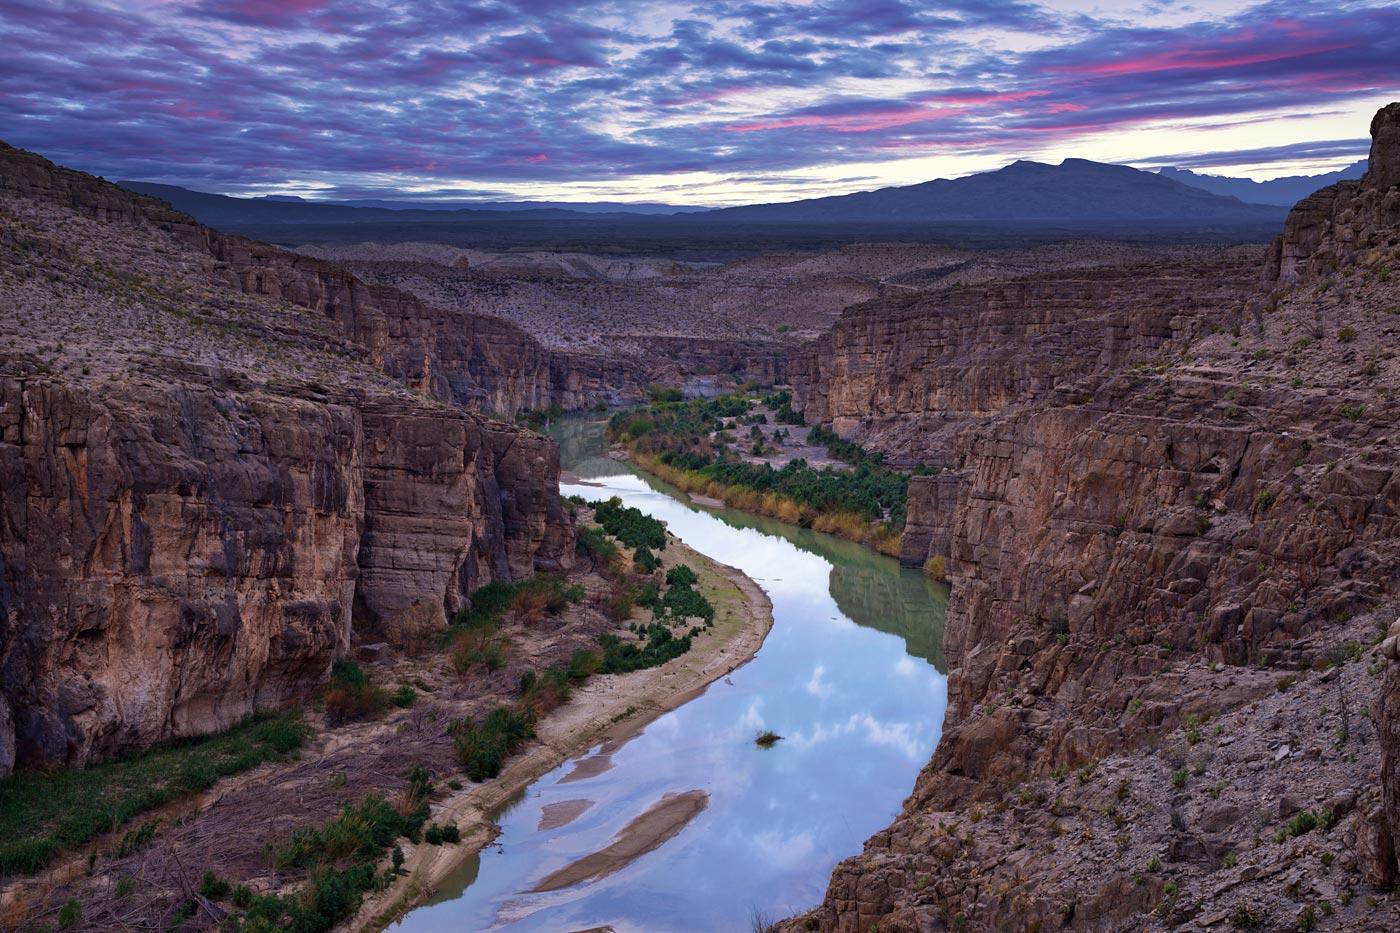 Big-Bend-National-Park-ABP-Hot-Springs-Canyon-Rim-sunset.jpg